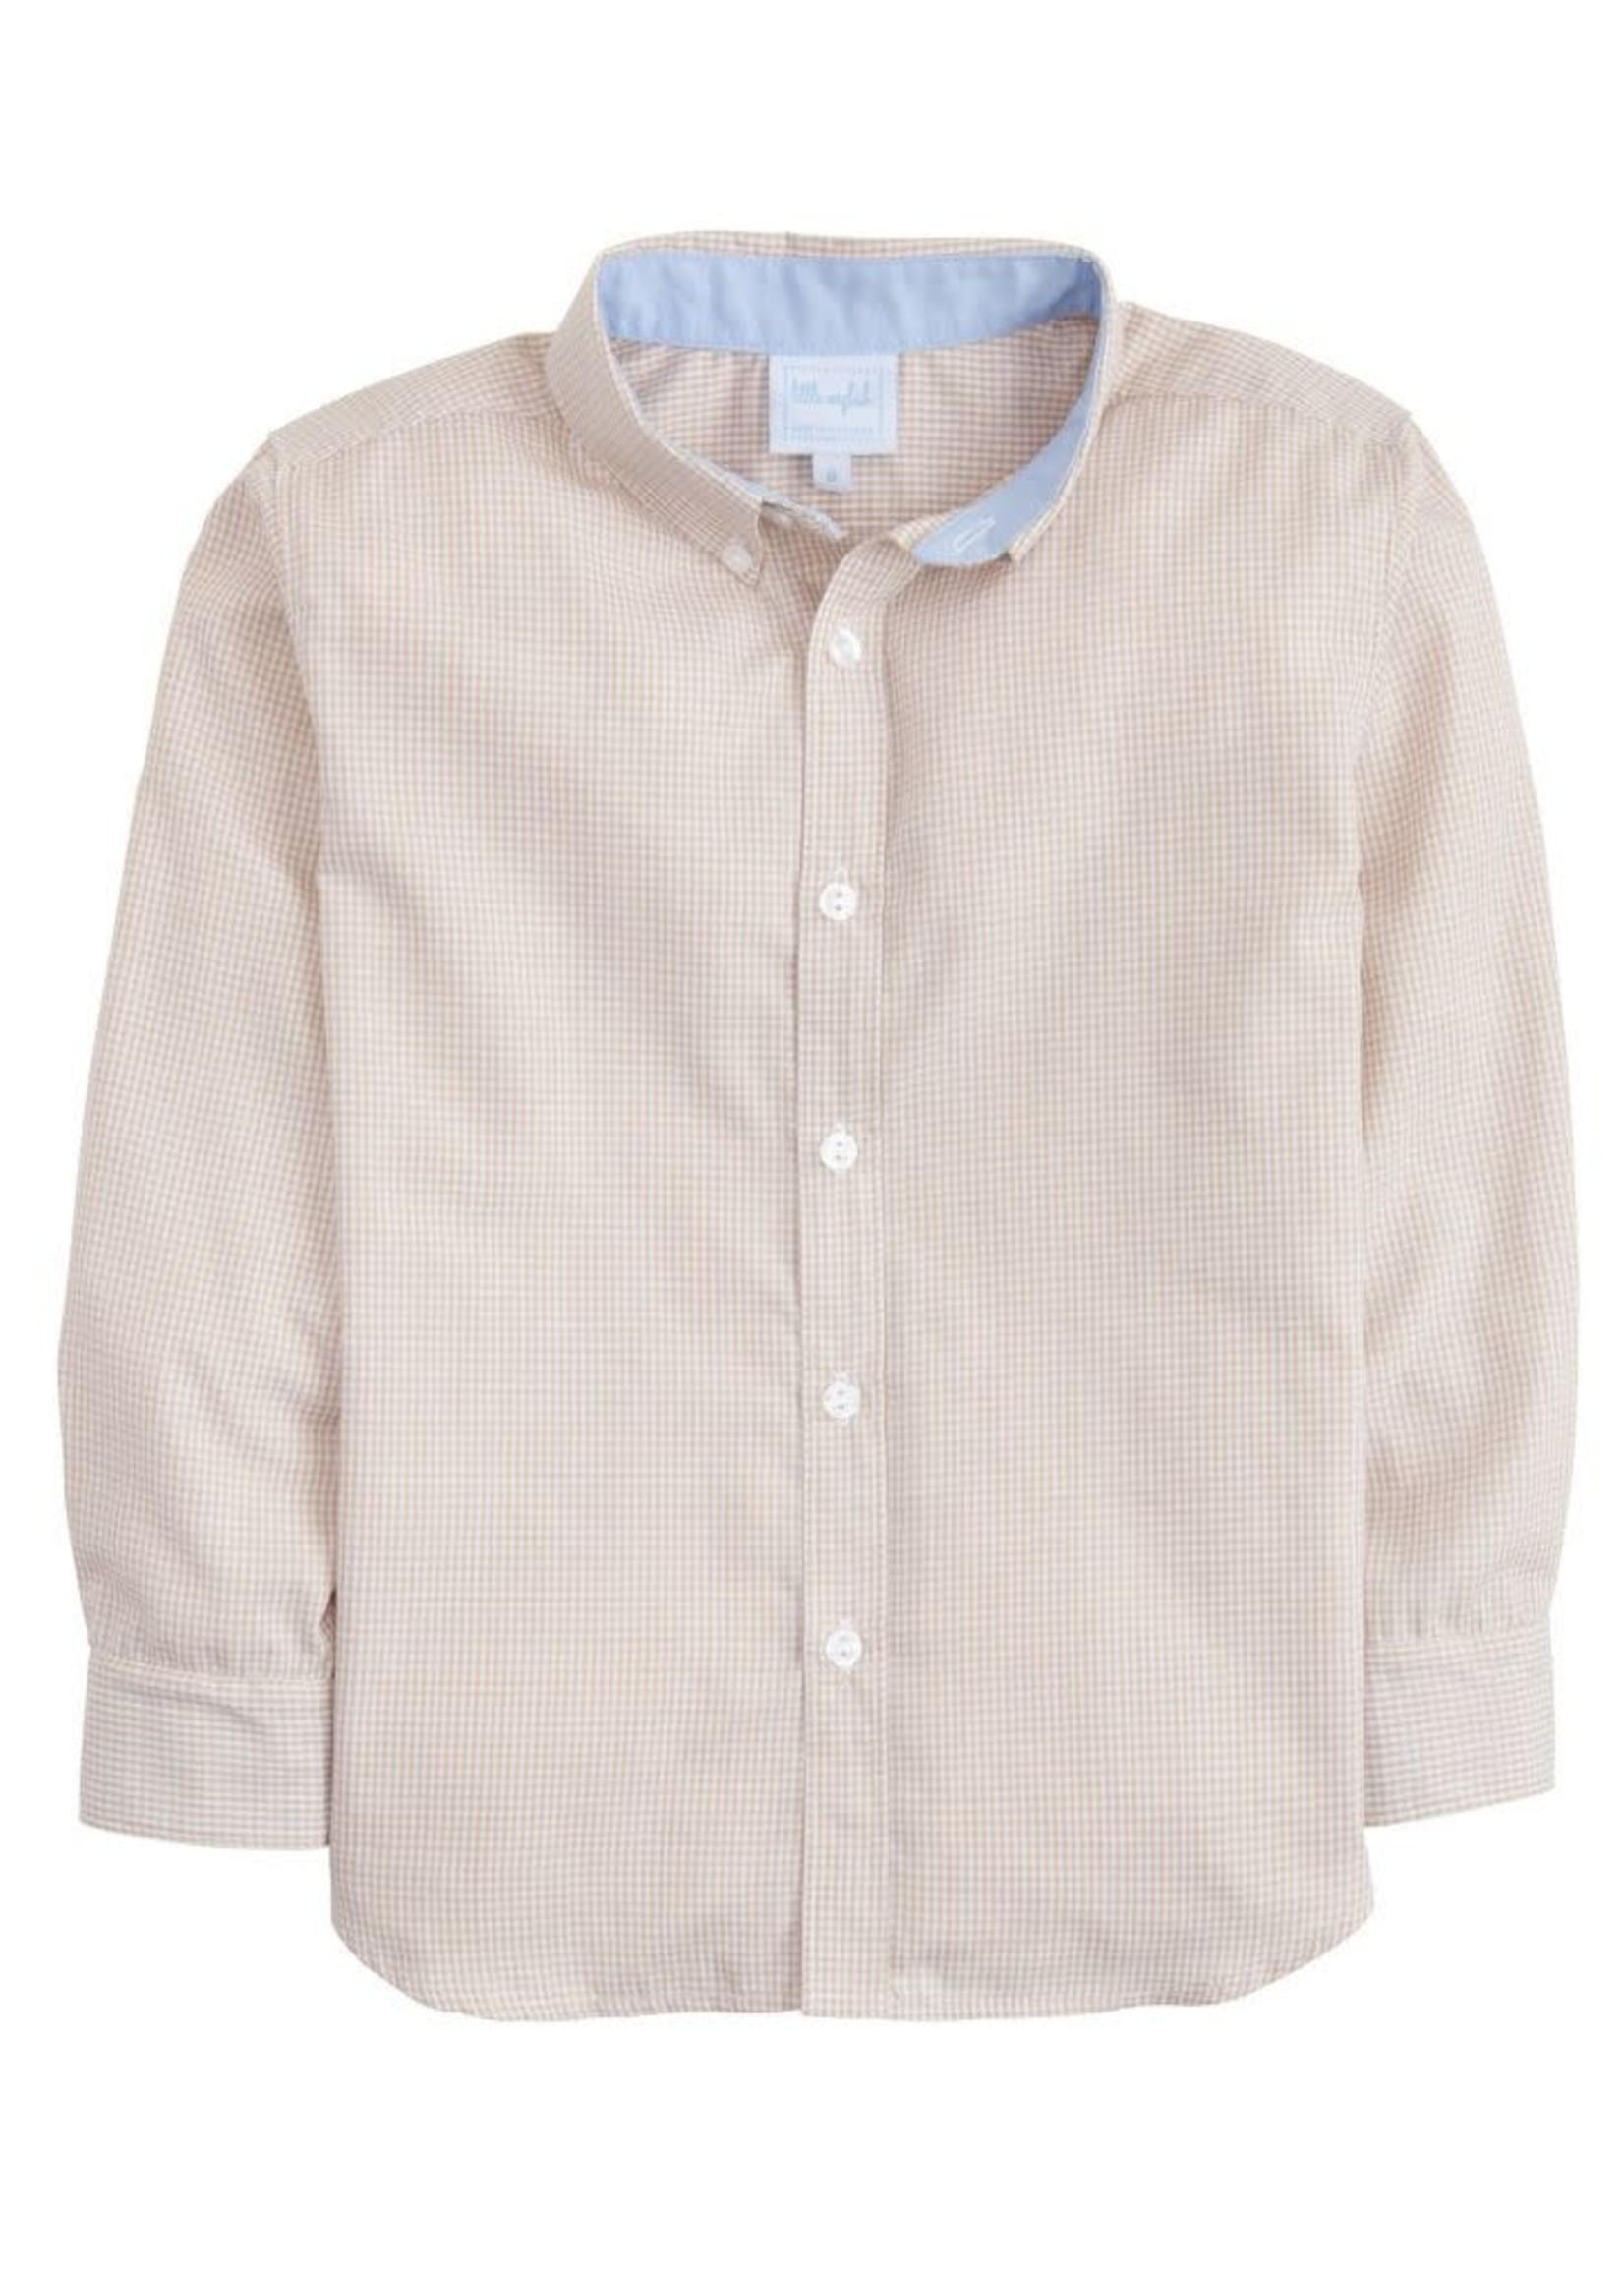 Little English Button Down Shirt - Tan Gingham